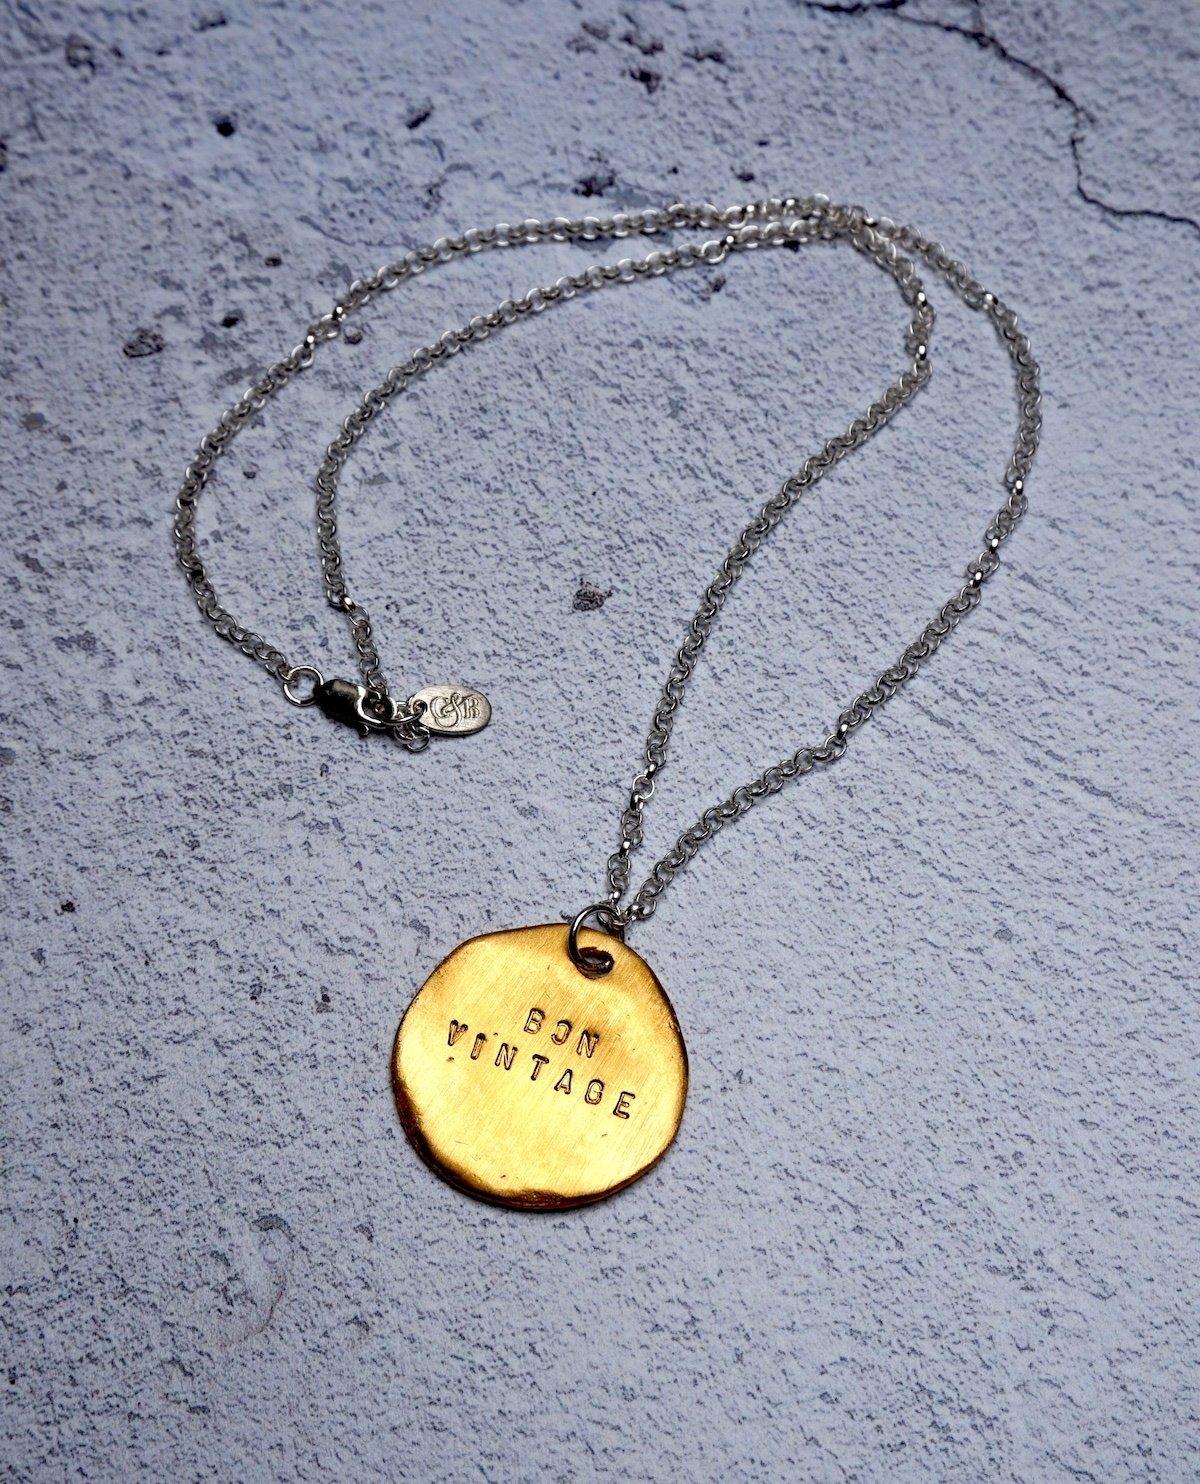 Bon Vintage necklace | fwp by rae